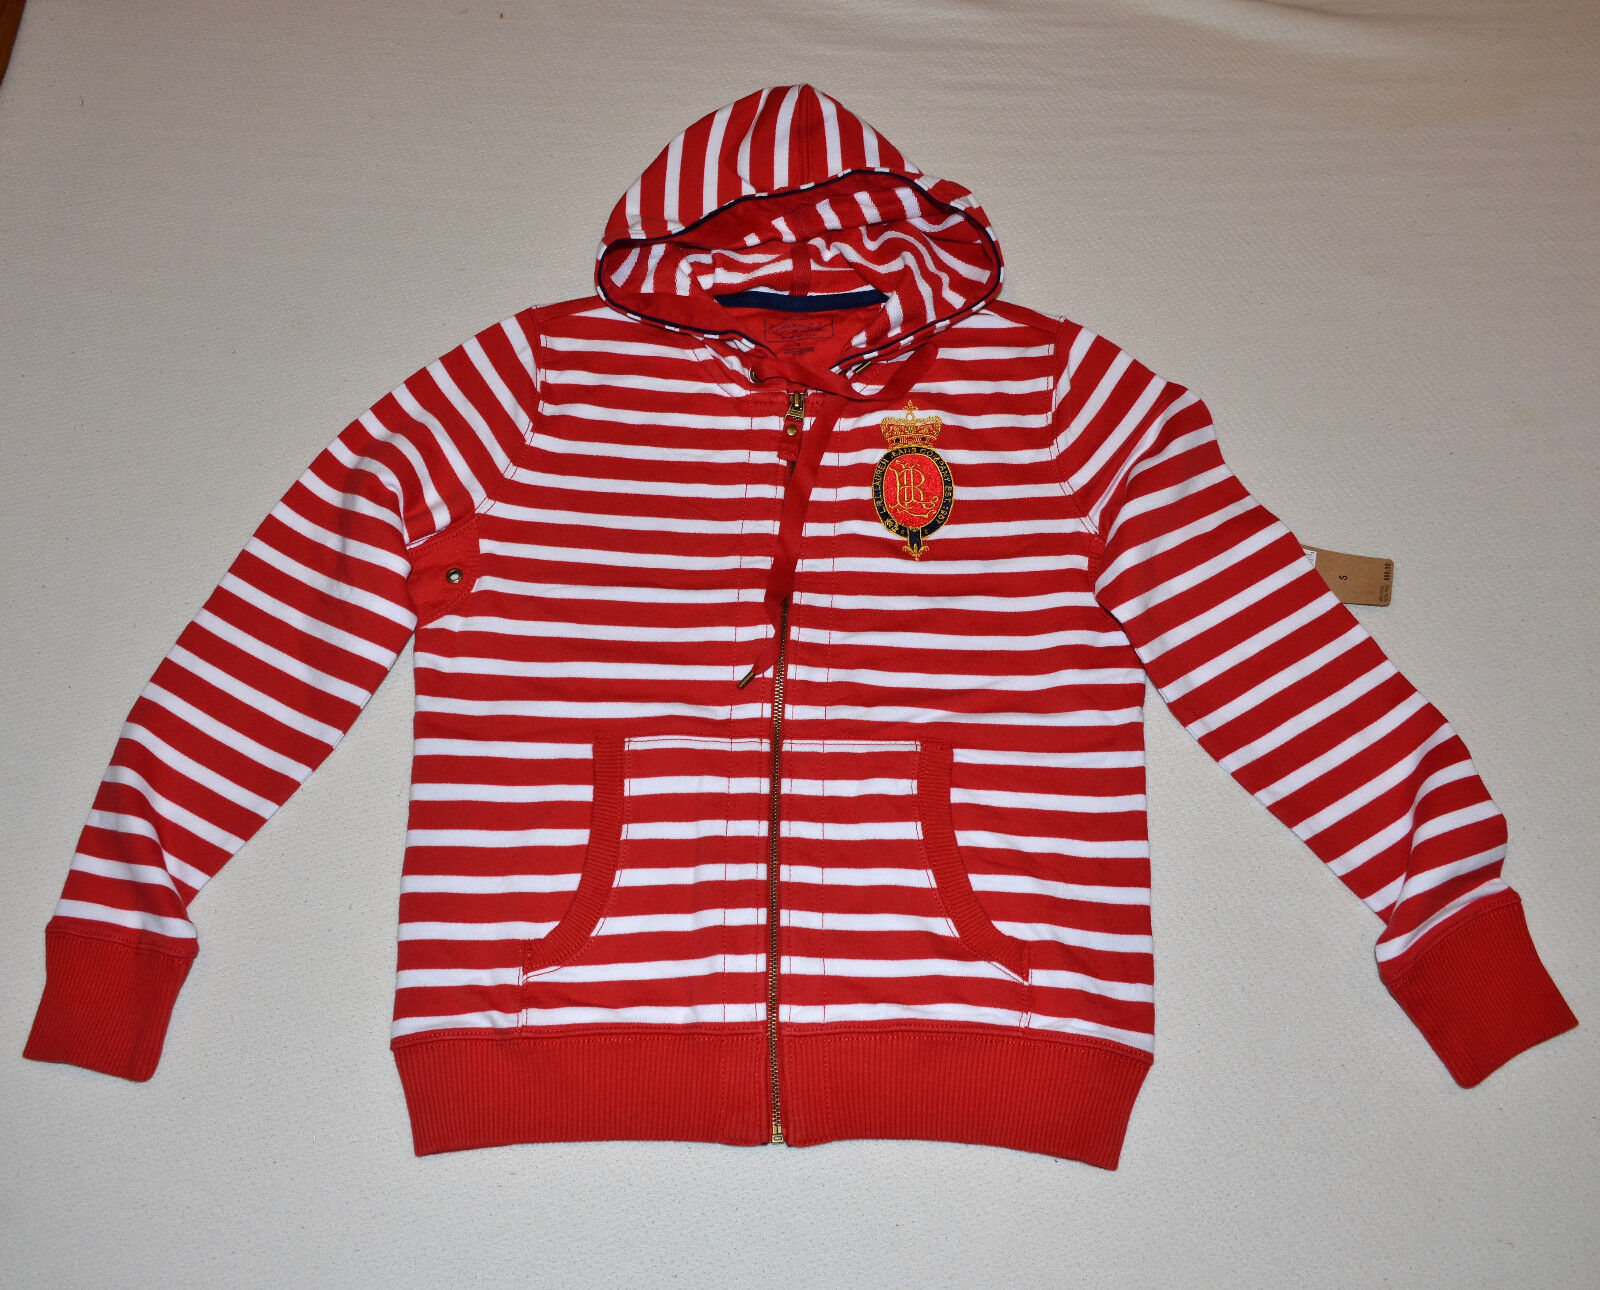 99 Ralph Lauren Jean Polo Provence Fashio Sweatshirt Sweater Zipped Red New S